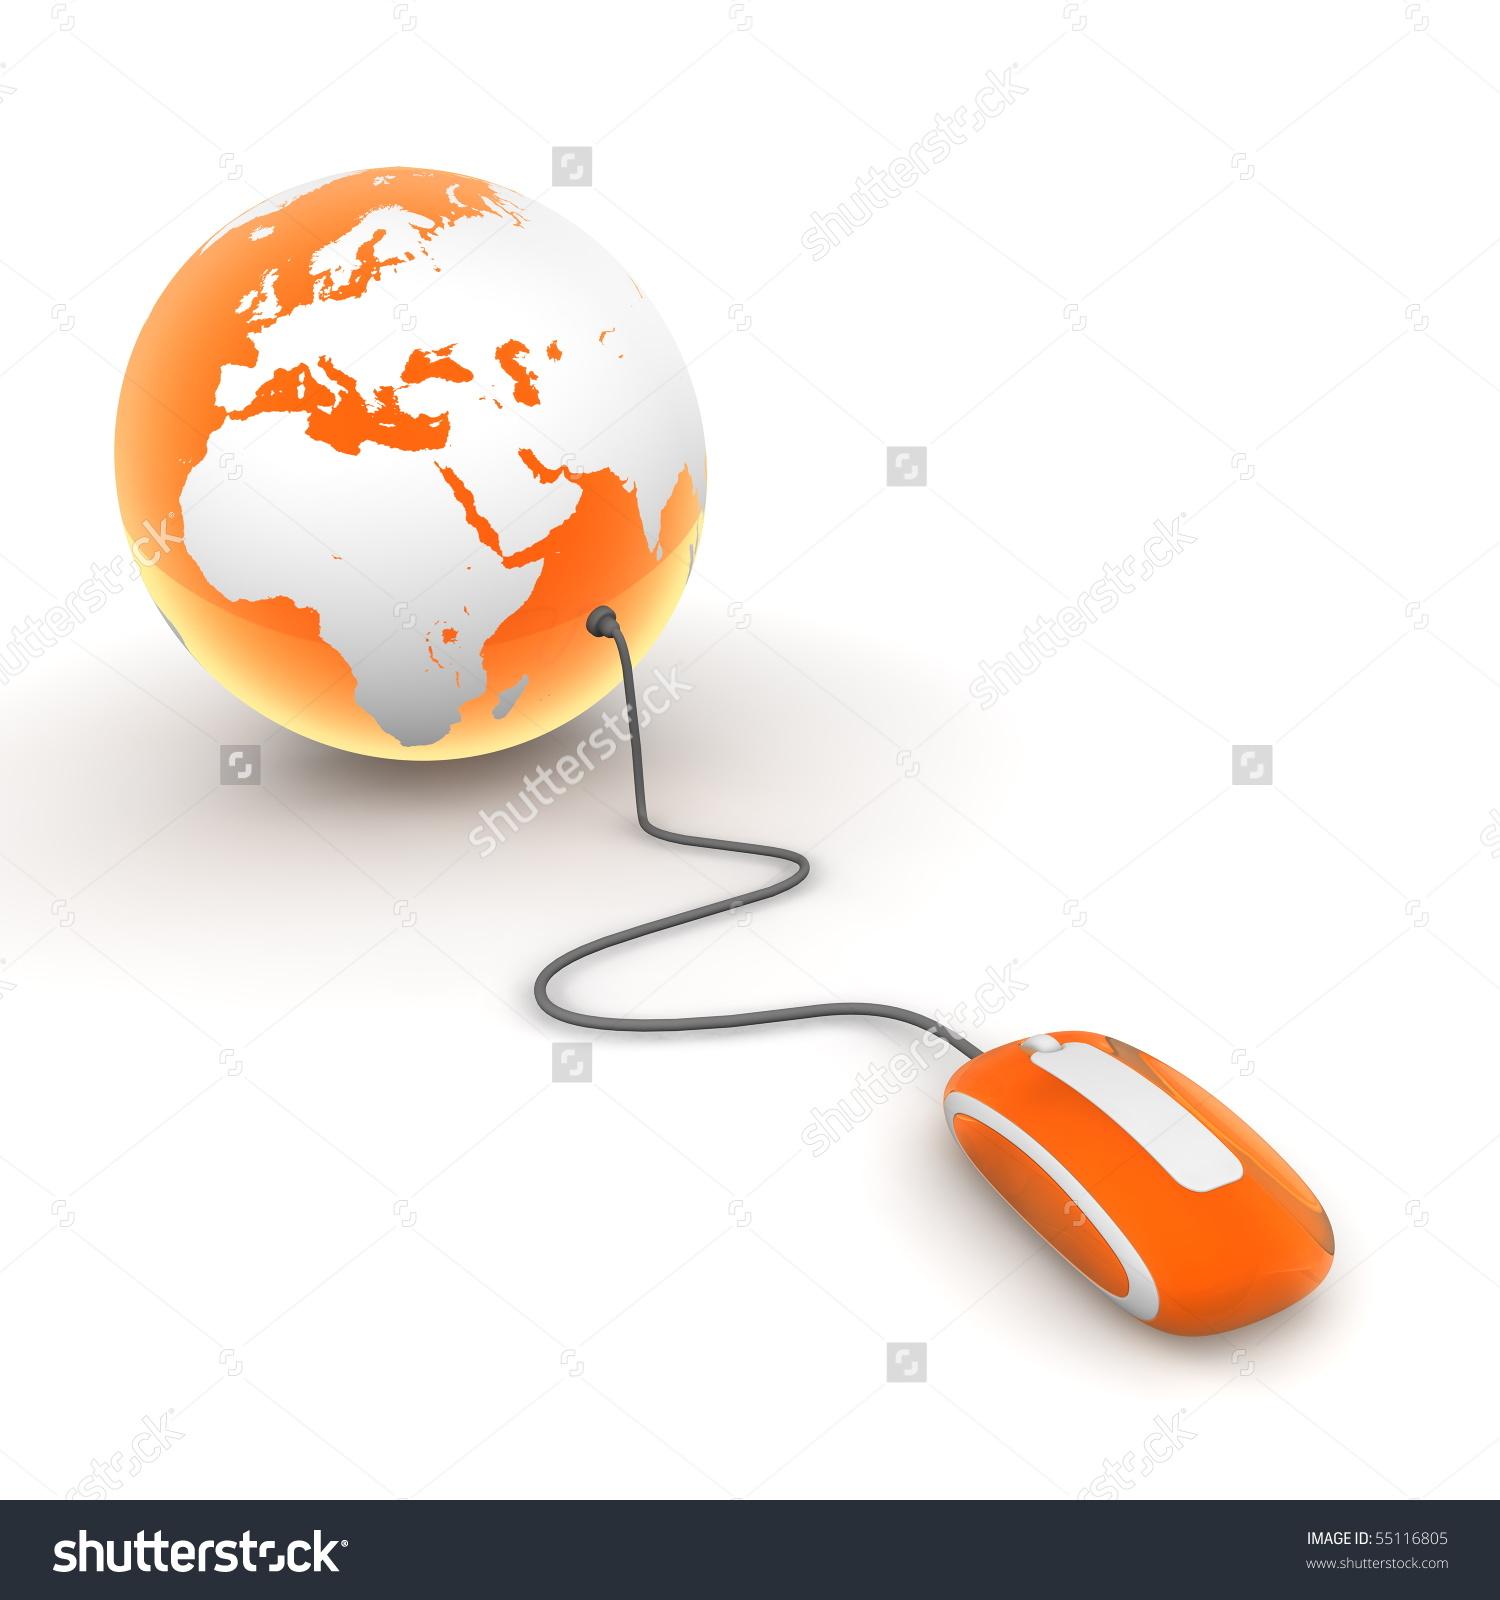 Computer save clipart translucent clip art freeuse Orange Translucent Computer Mouse Connected To A Orange Glossy ... clip art freeuse